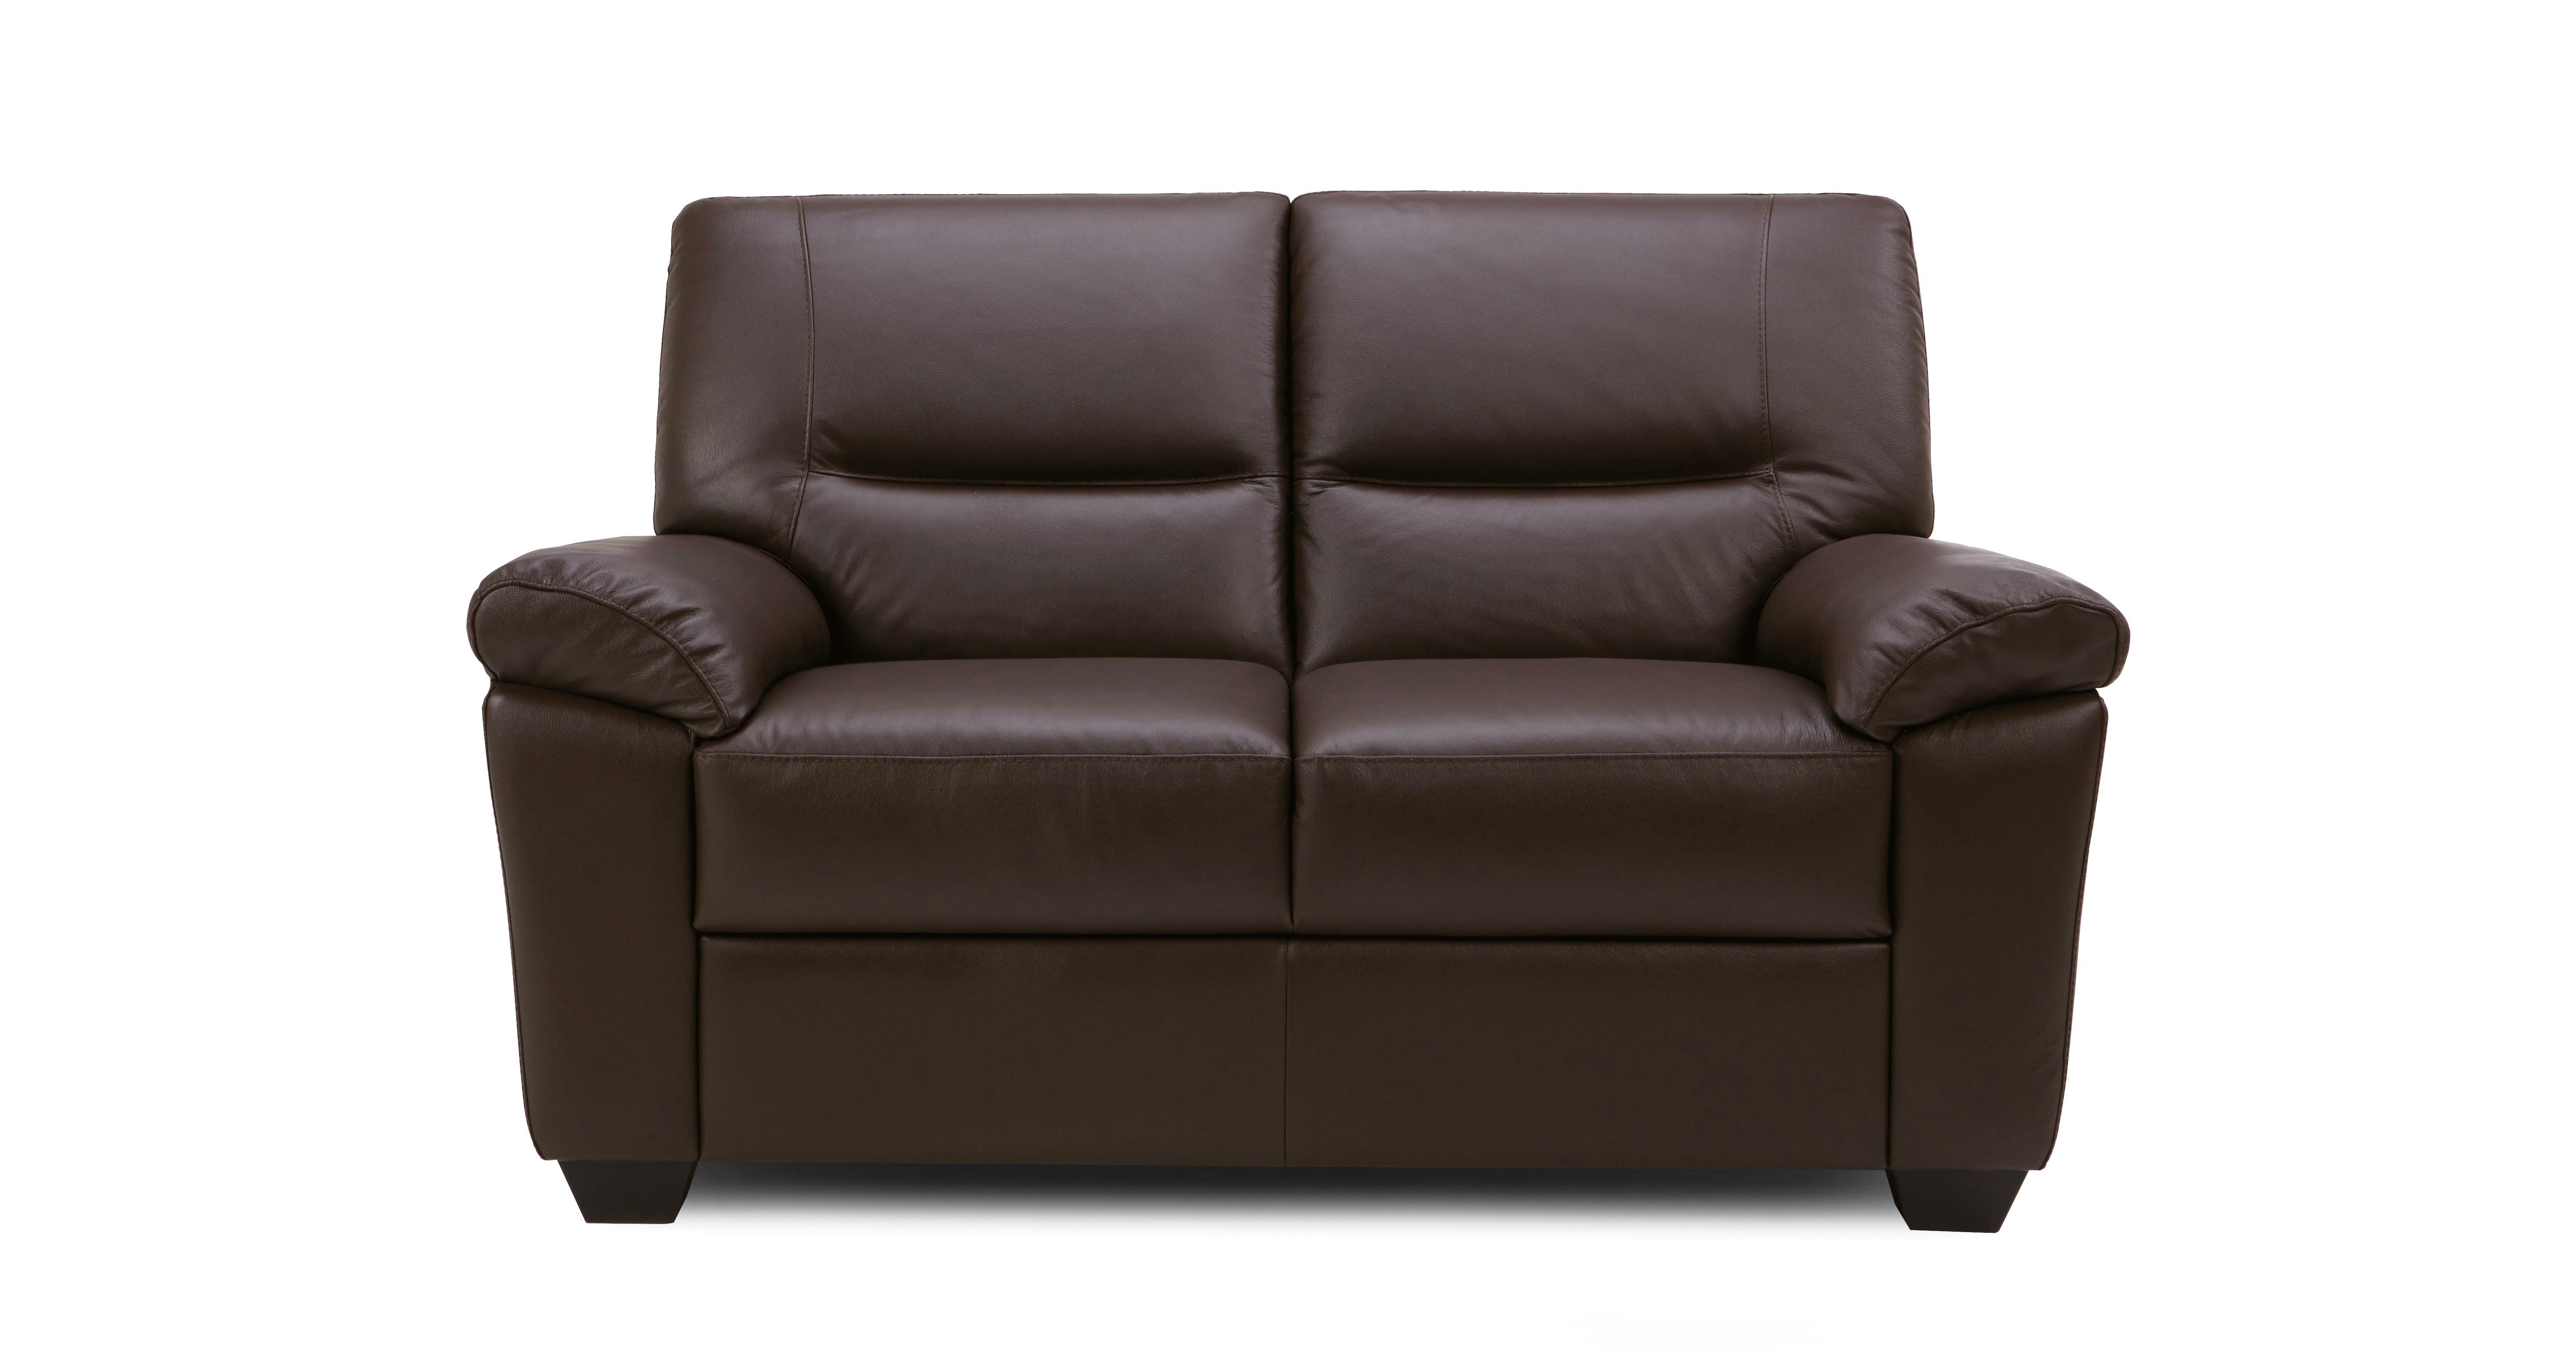 Prime Thomas Clearance 3 Seater Sofa 2 Seater Sofa Recliner Chair Stool Beutiful Home Inspiration Xortanetmahrainfo